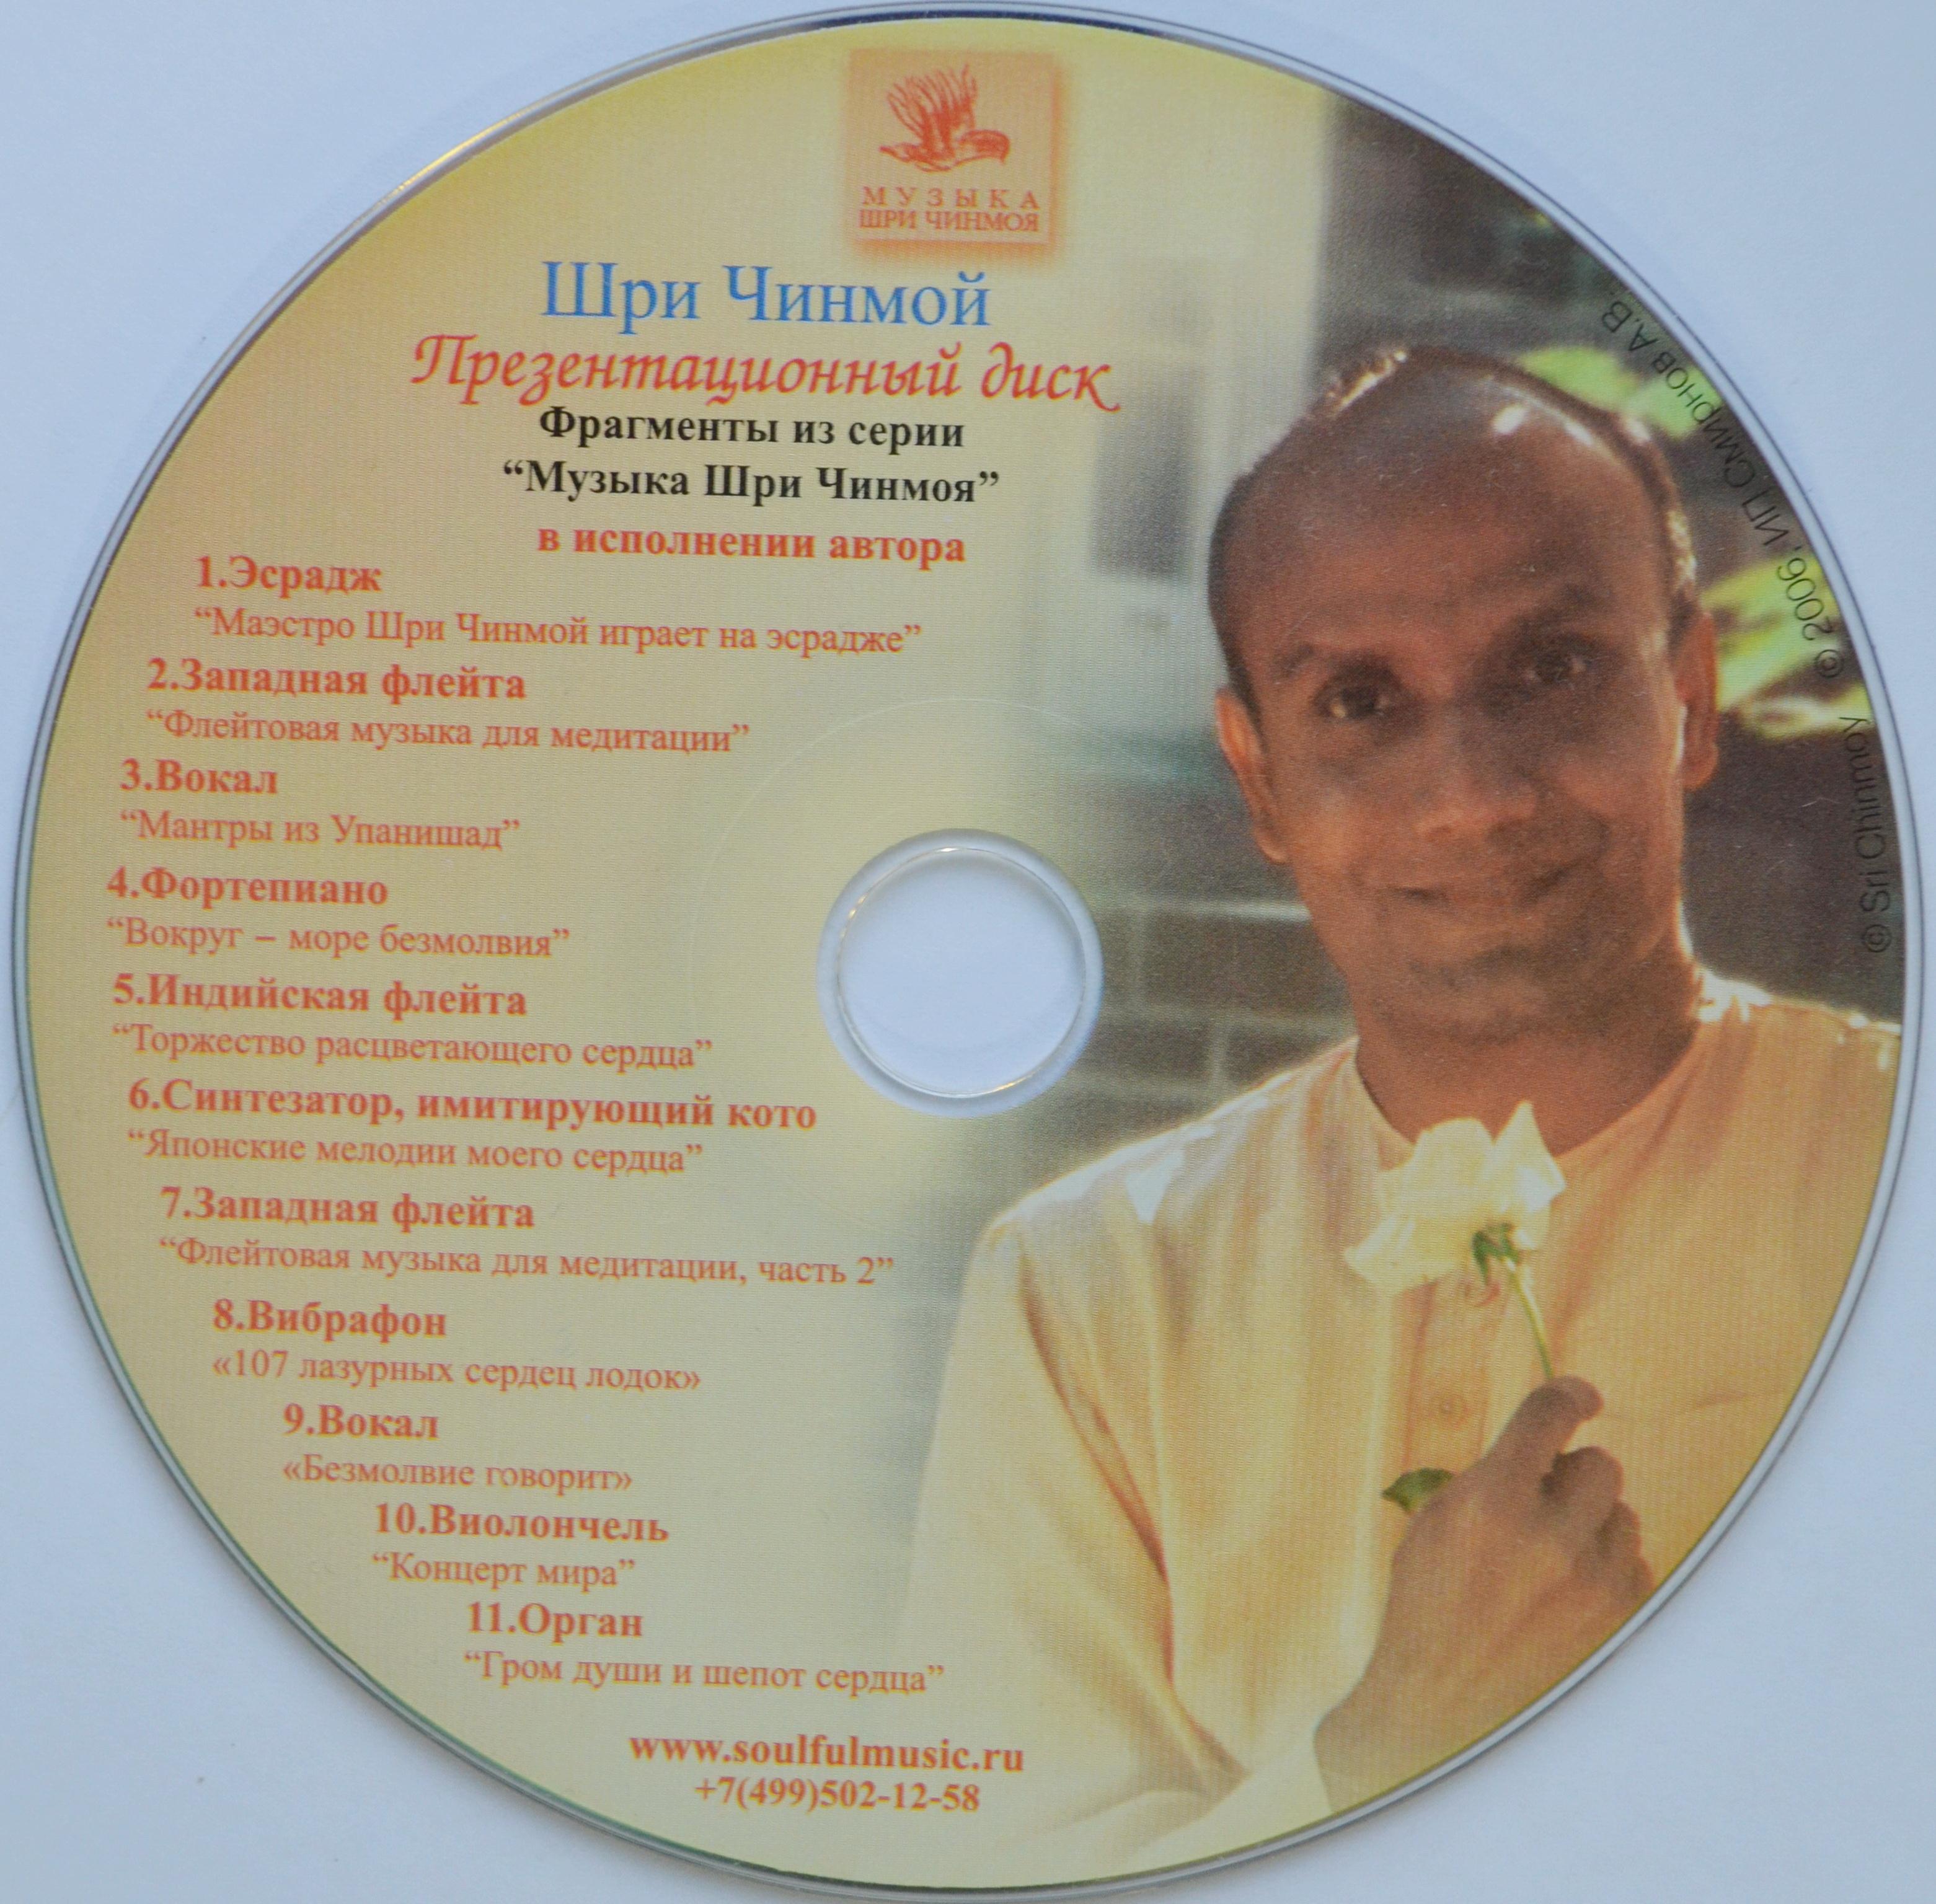 muzyka-shri-chinmoya